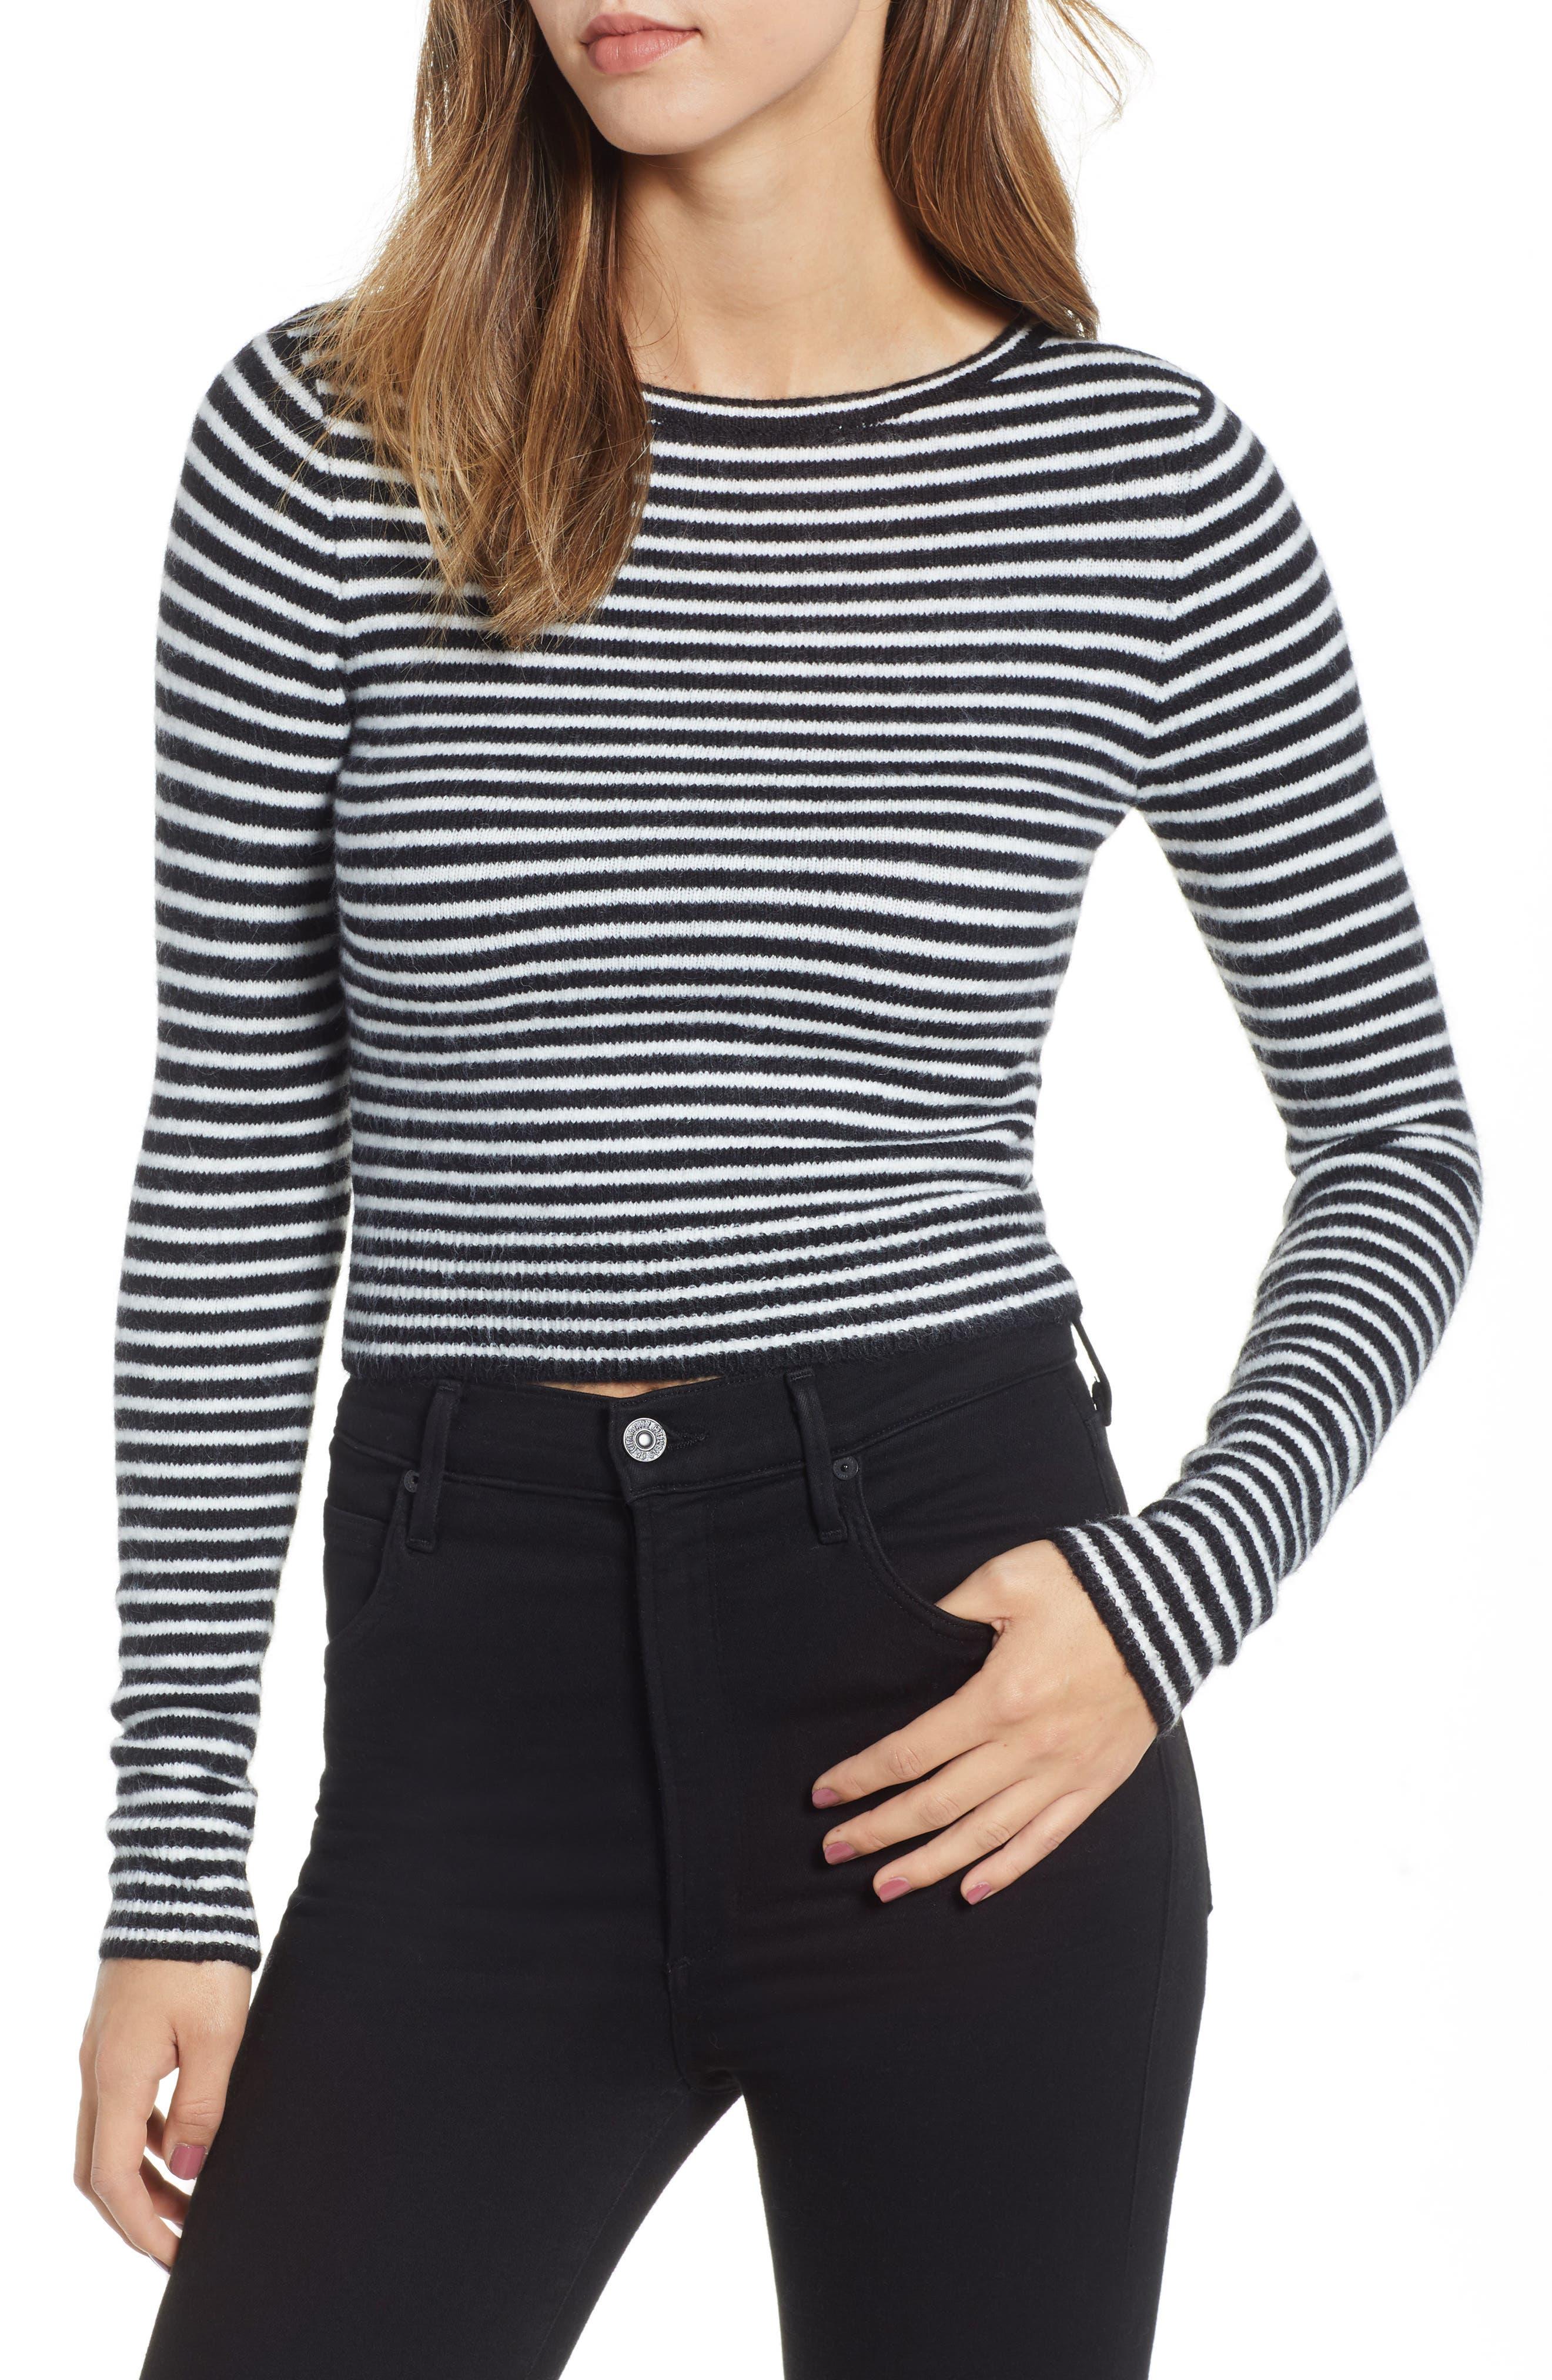 AMUSE SOCIETY Nova Stripe Crop Sweater in Black